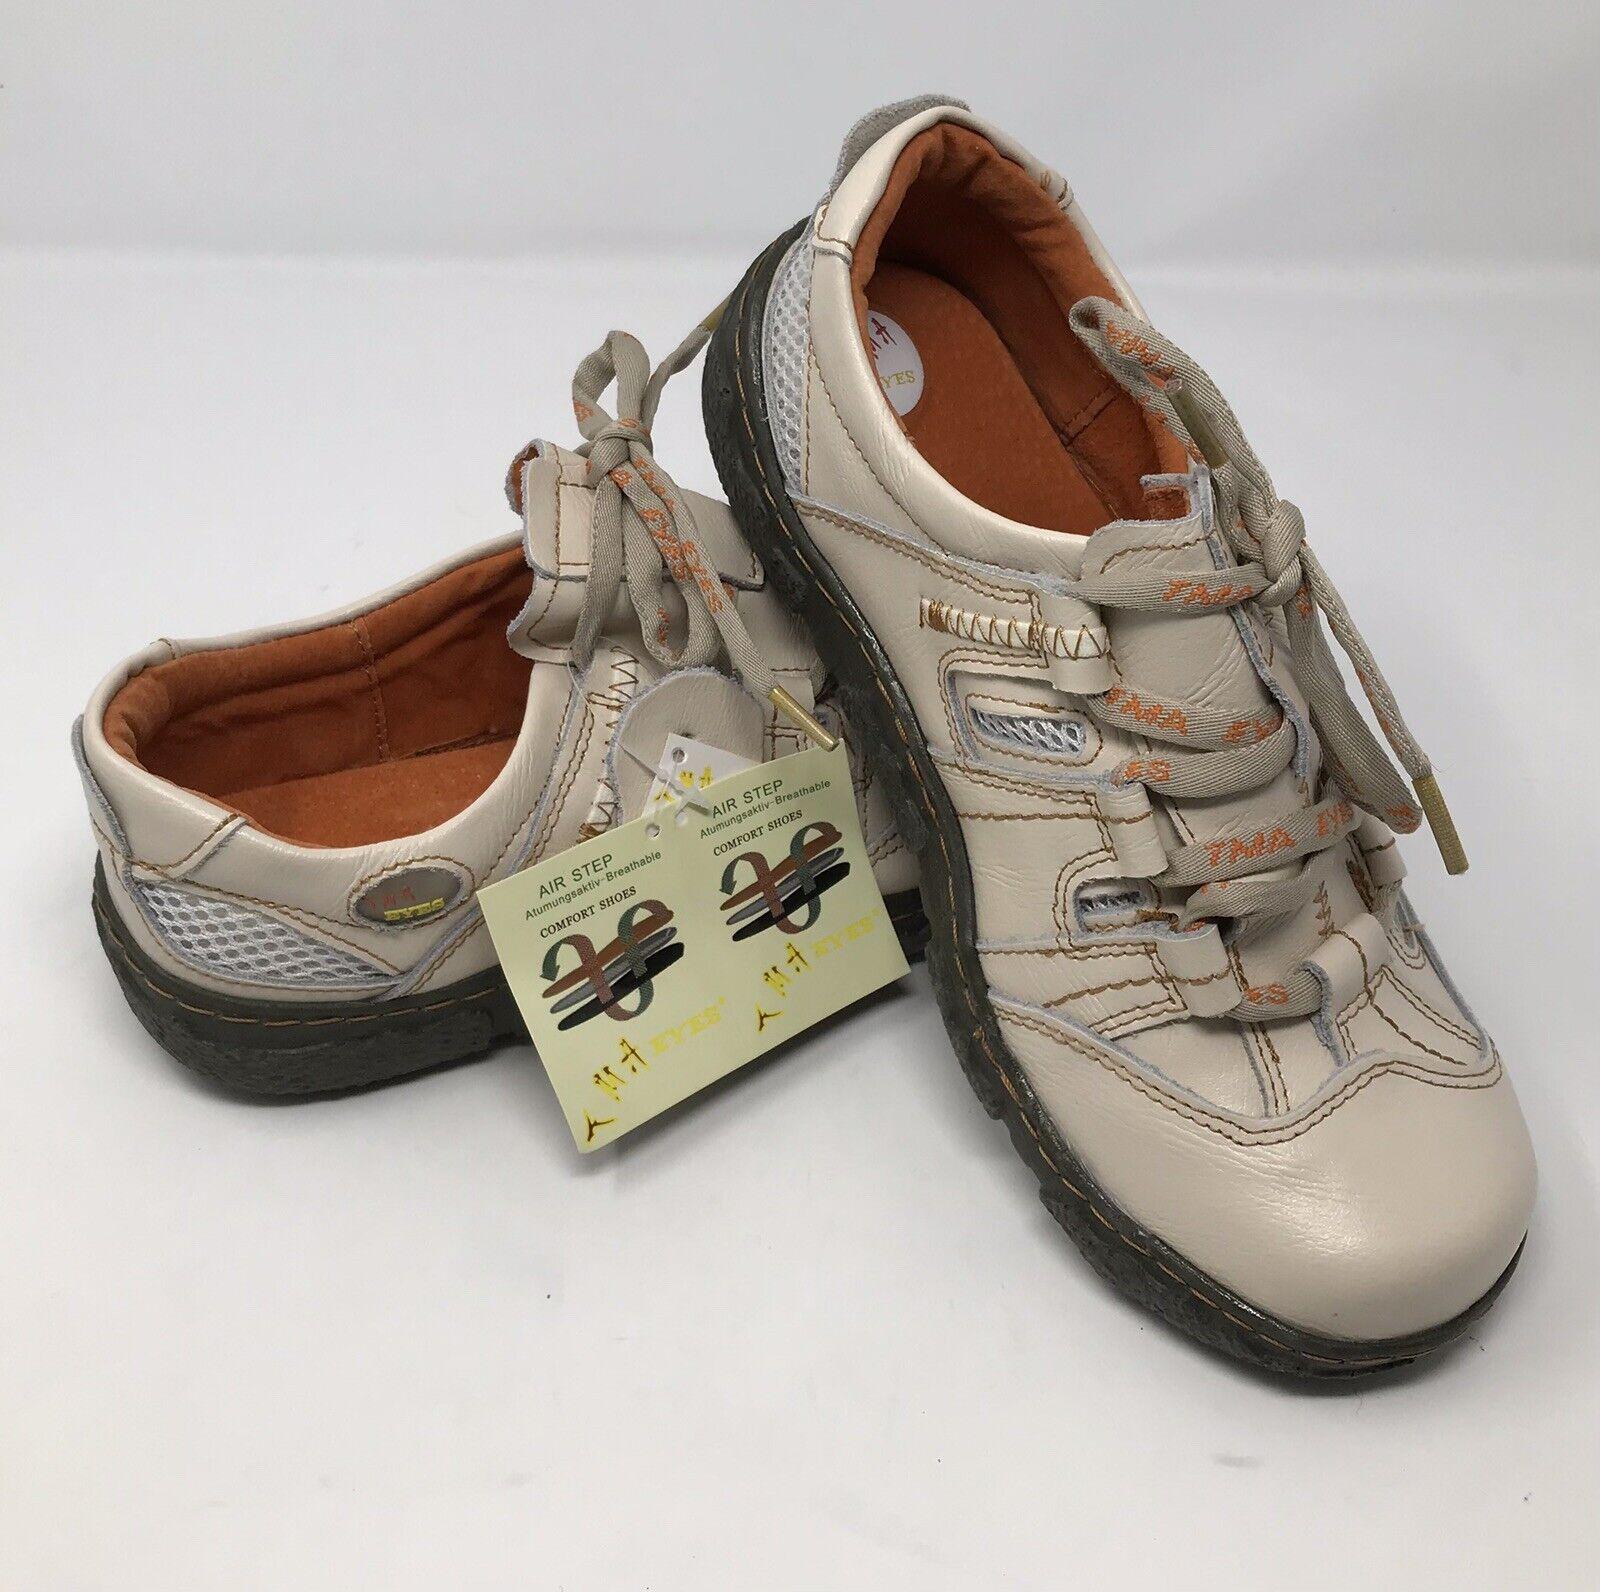 TMA Eyes Leather Sneakers Womens Size EU 40 US 8.5 Germany Leather Upper Walking